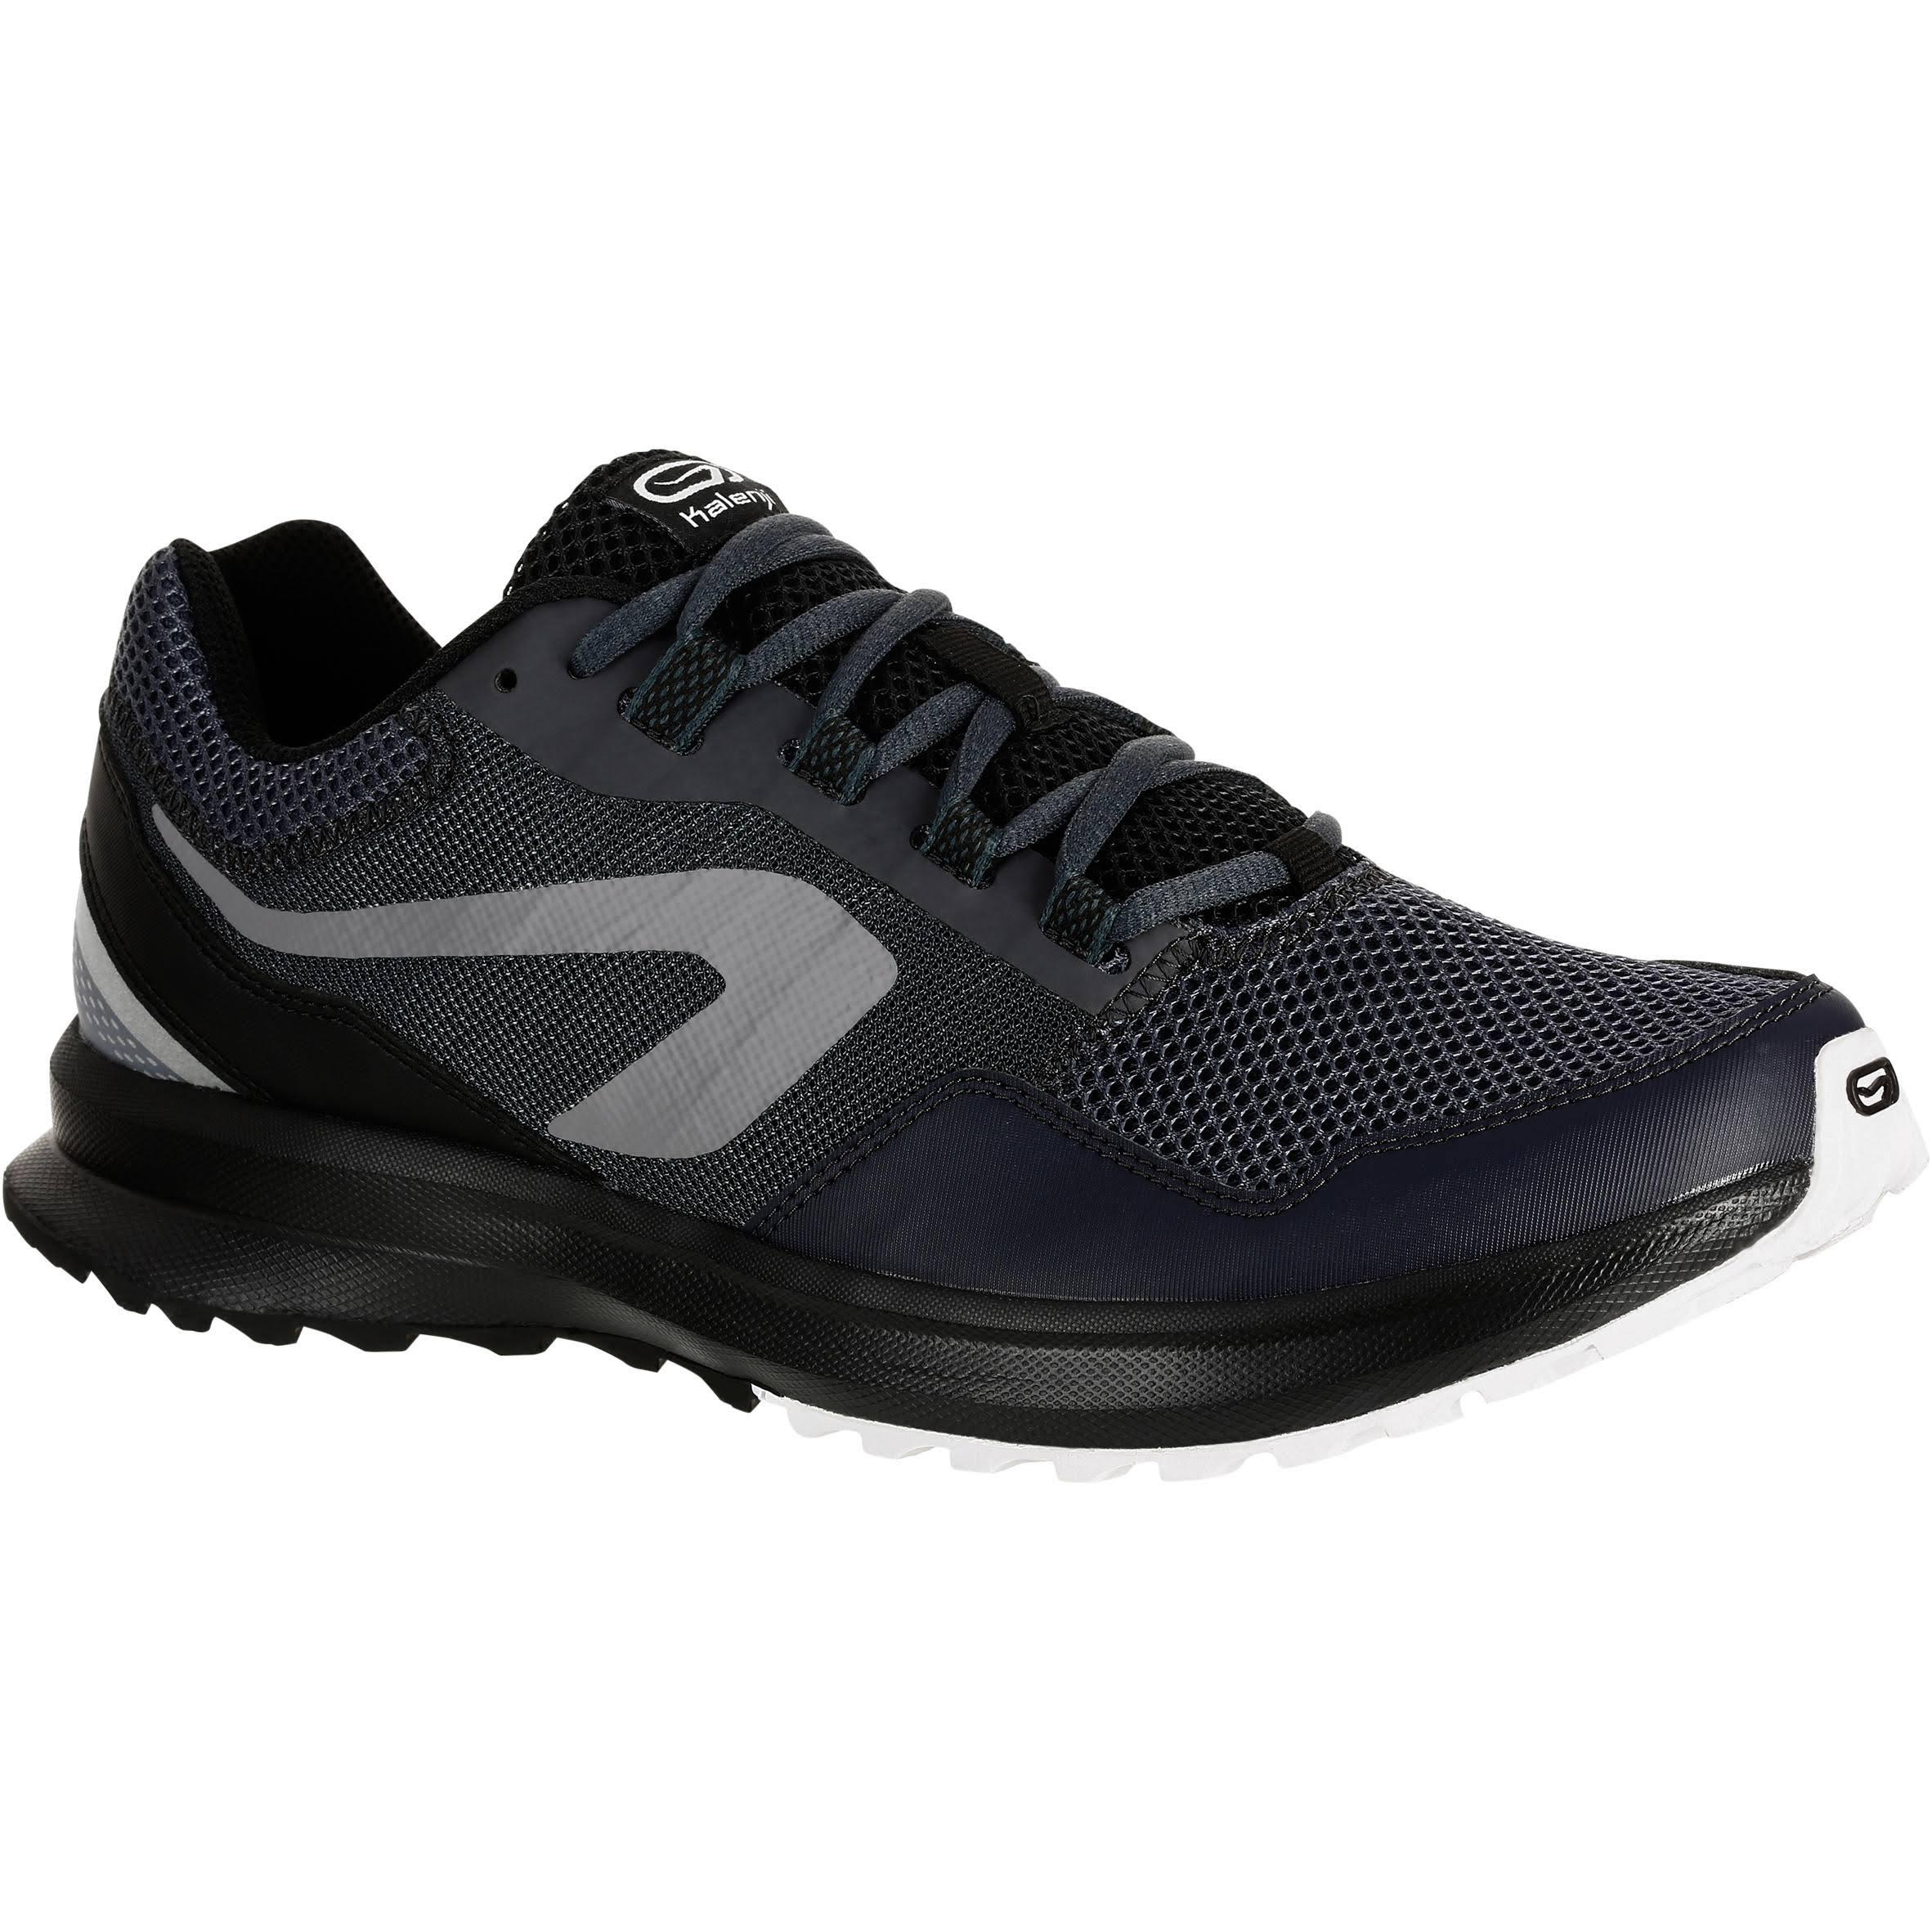 Kalenji Run Active Grip Men's Running Shoe - Grey/Black